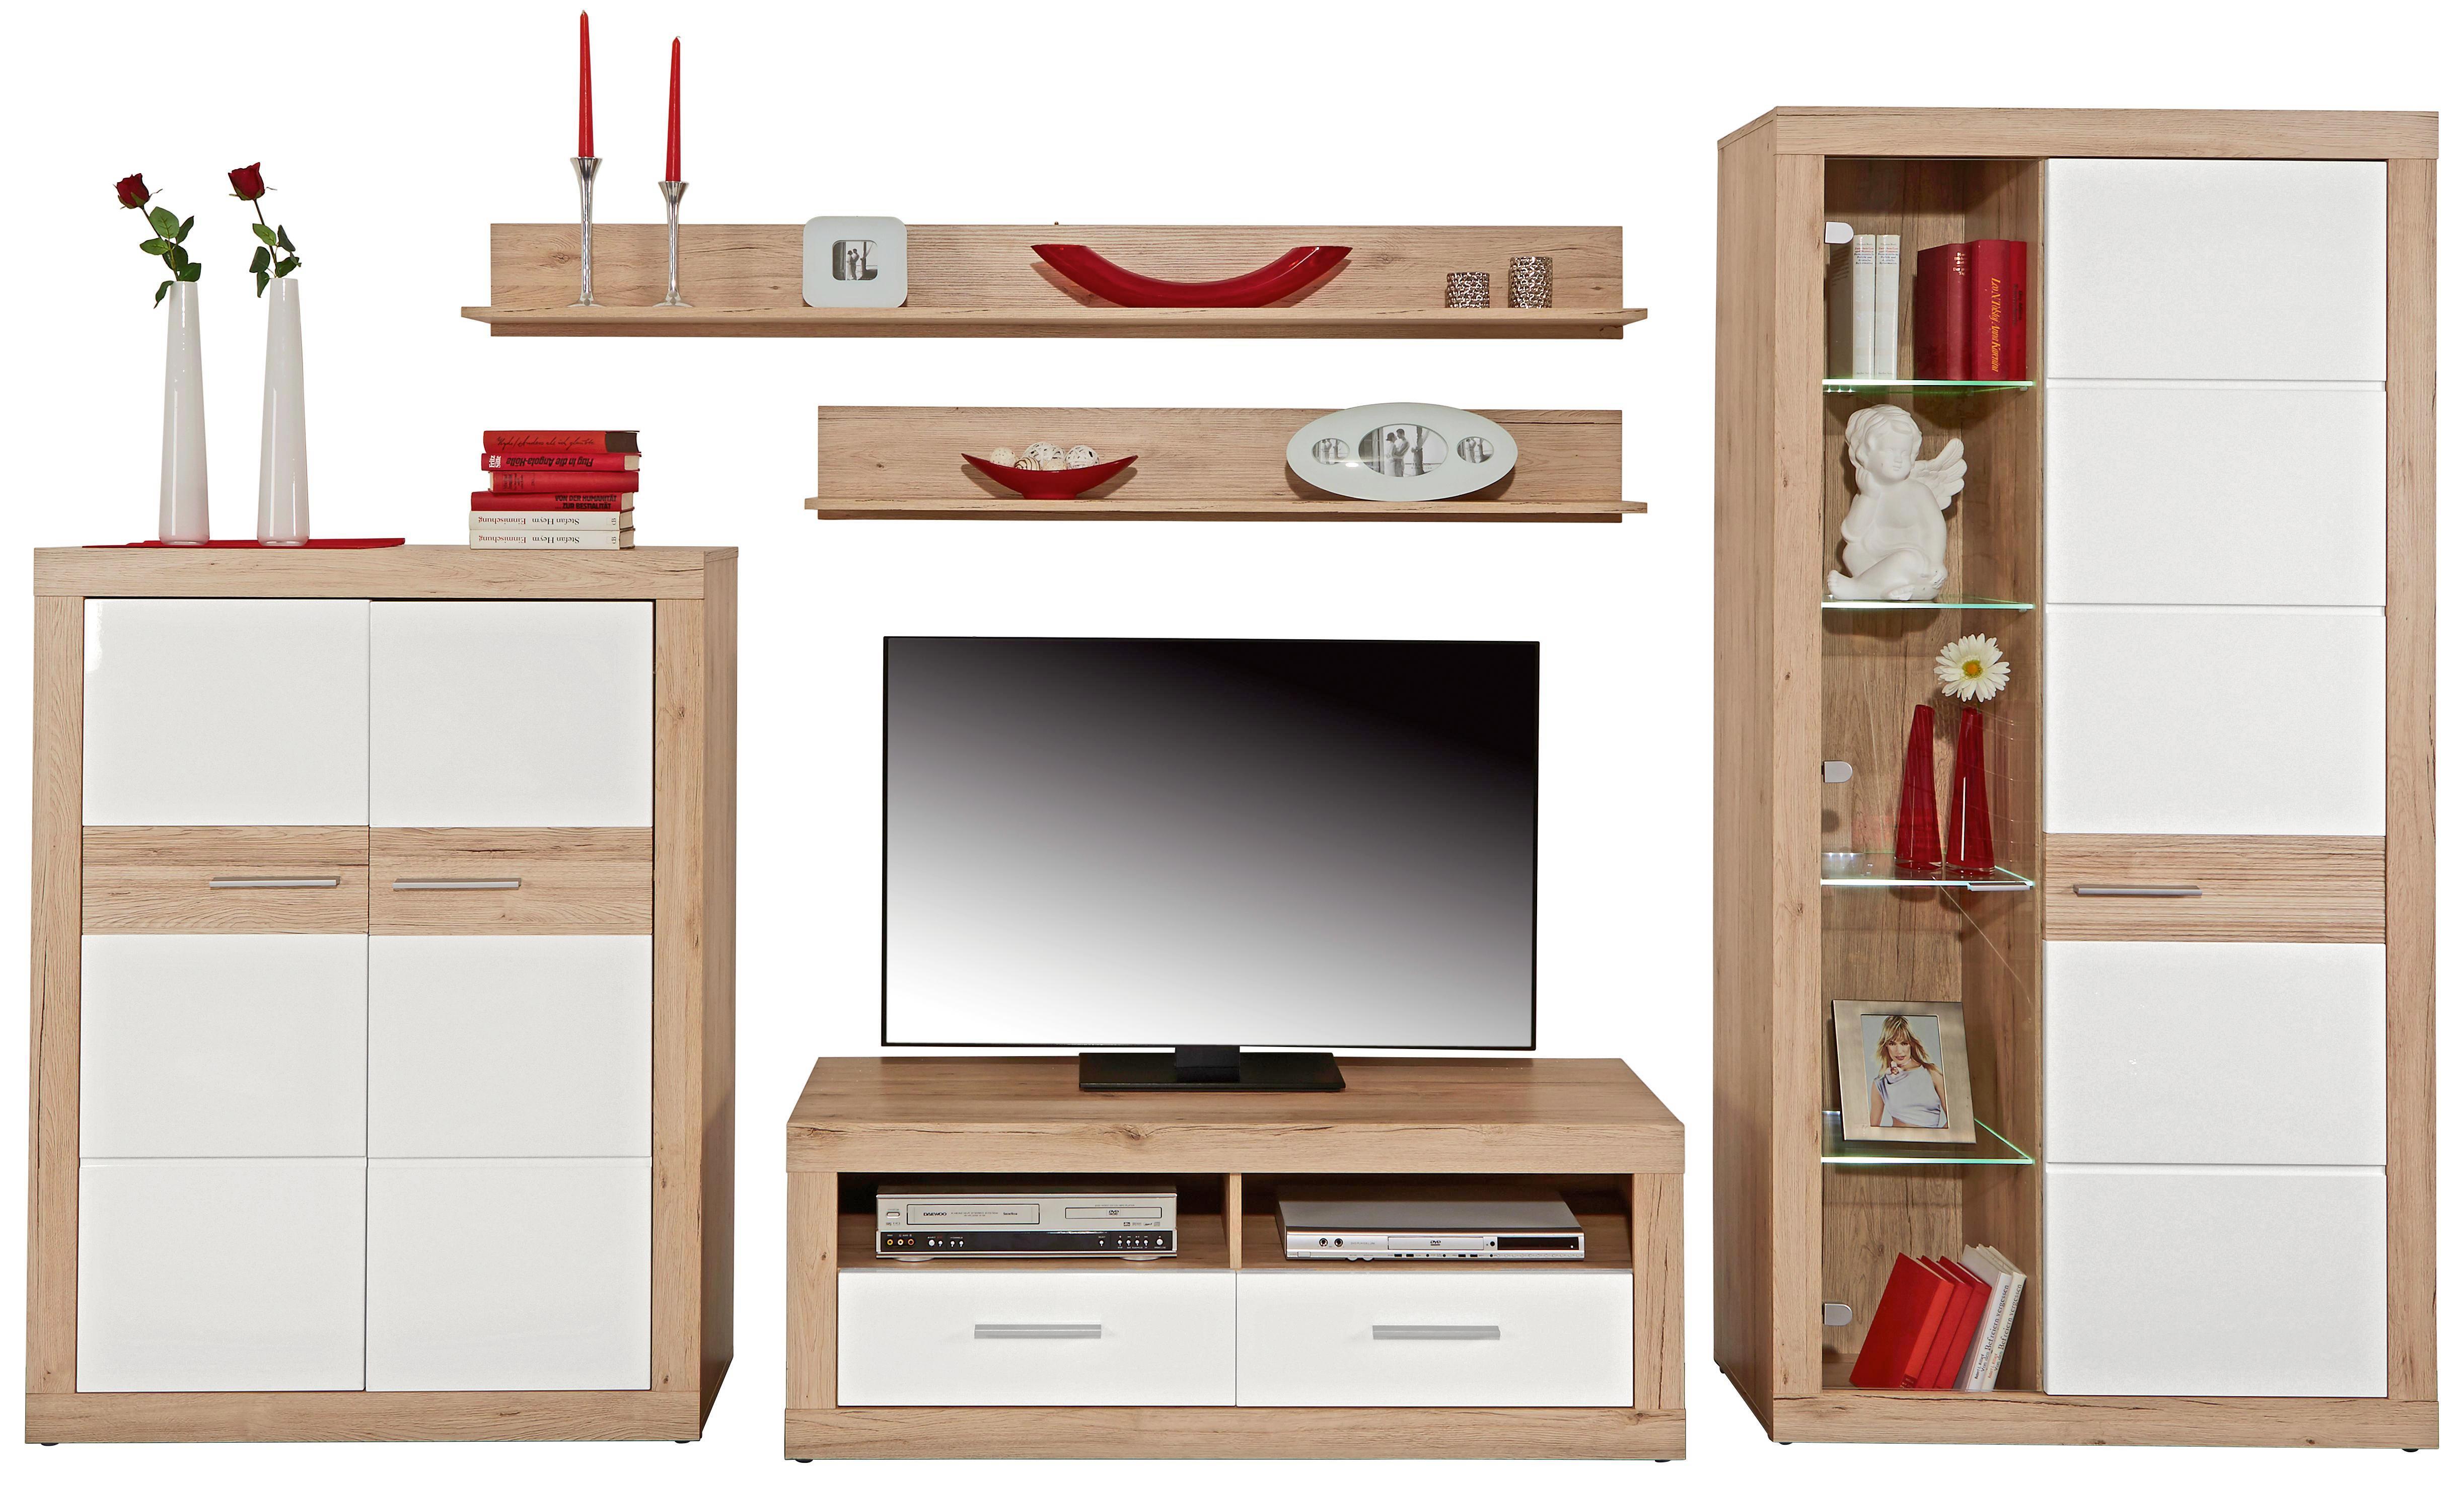 Schlafzimmer Komplett Moebelix Lattenroste 90x180 Ikea Augsburg